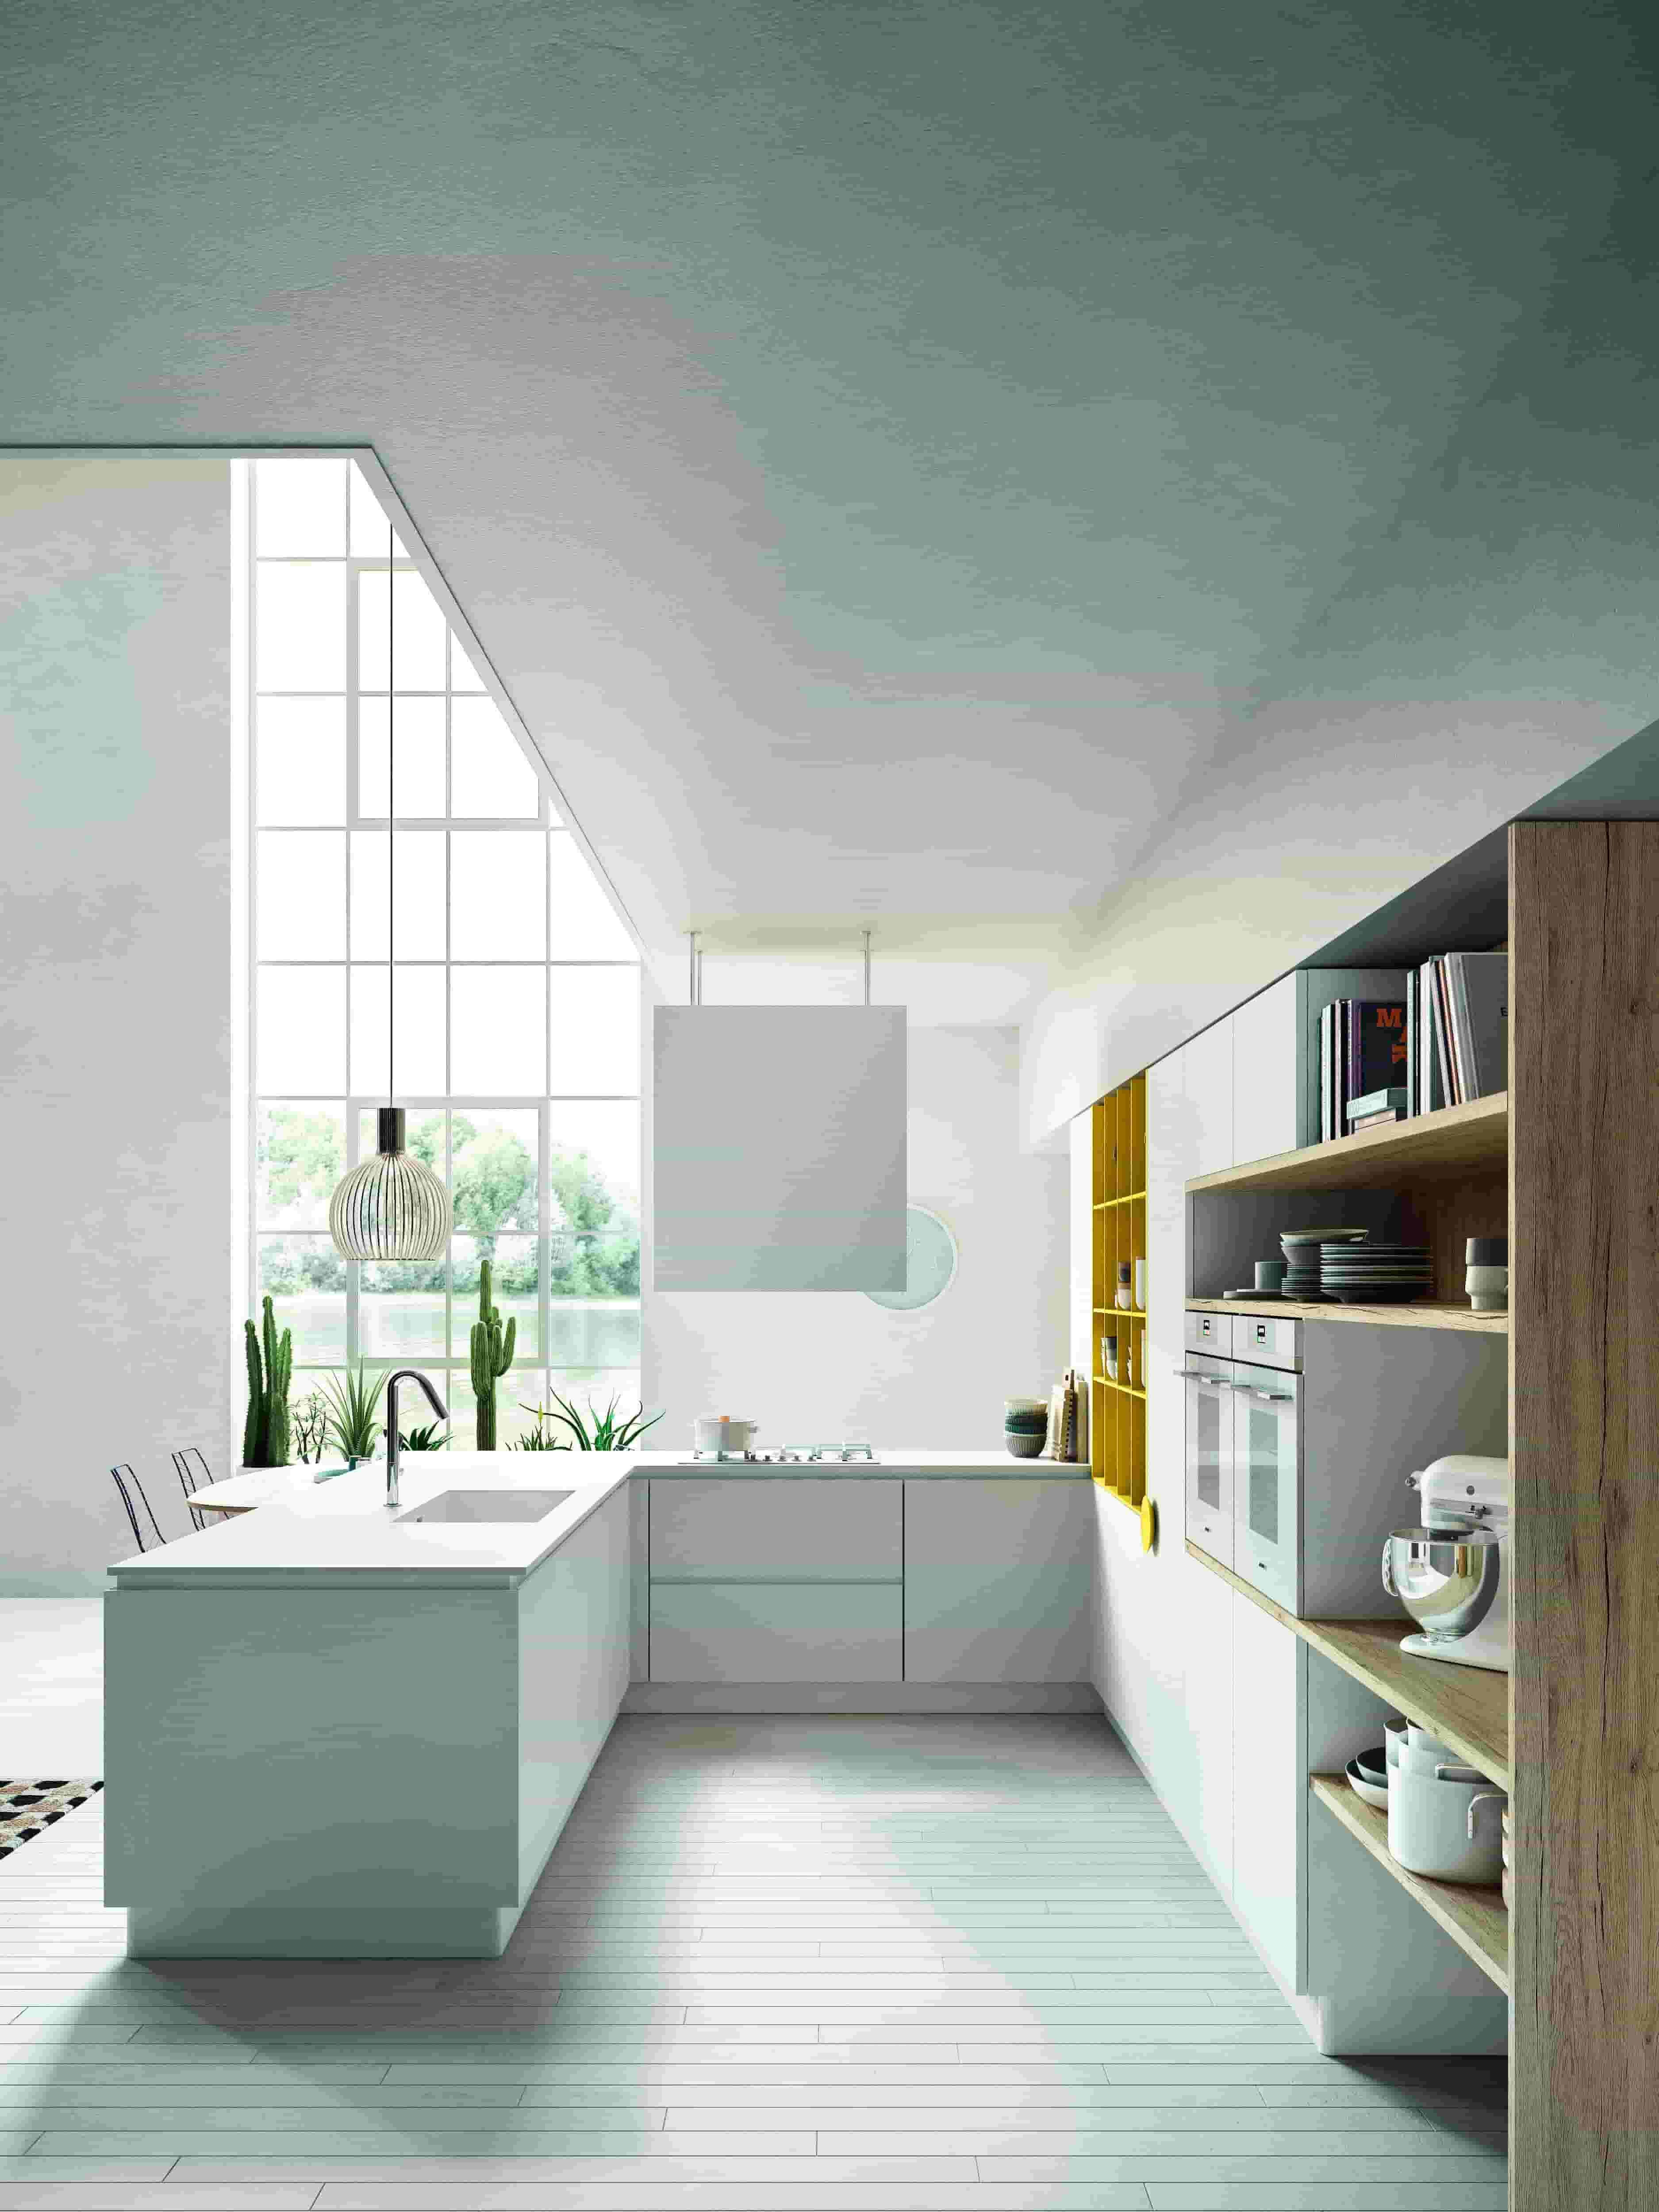 Cucina total white modern a Astra con inserto giallo